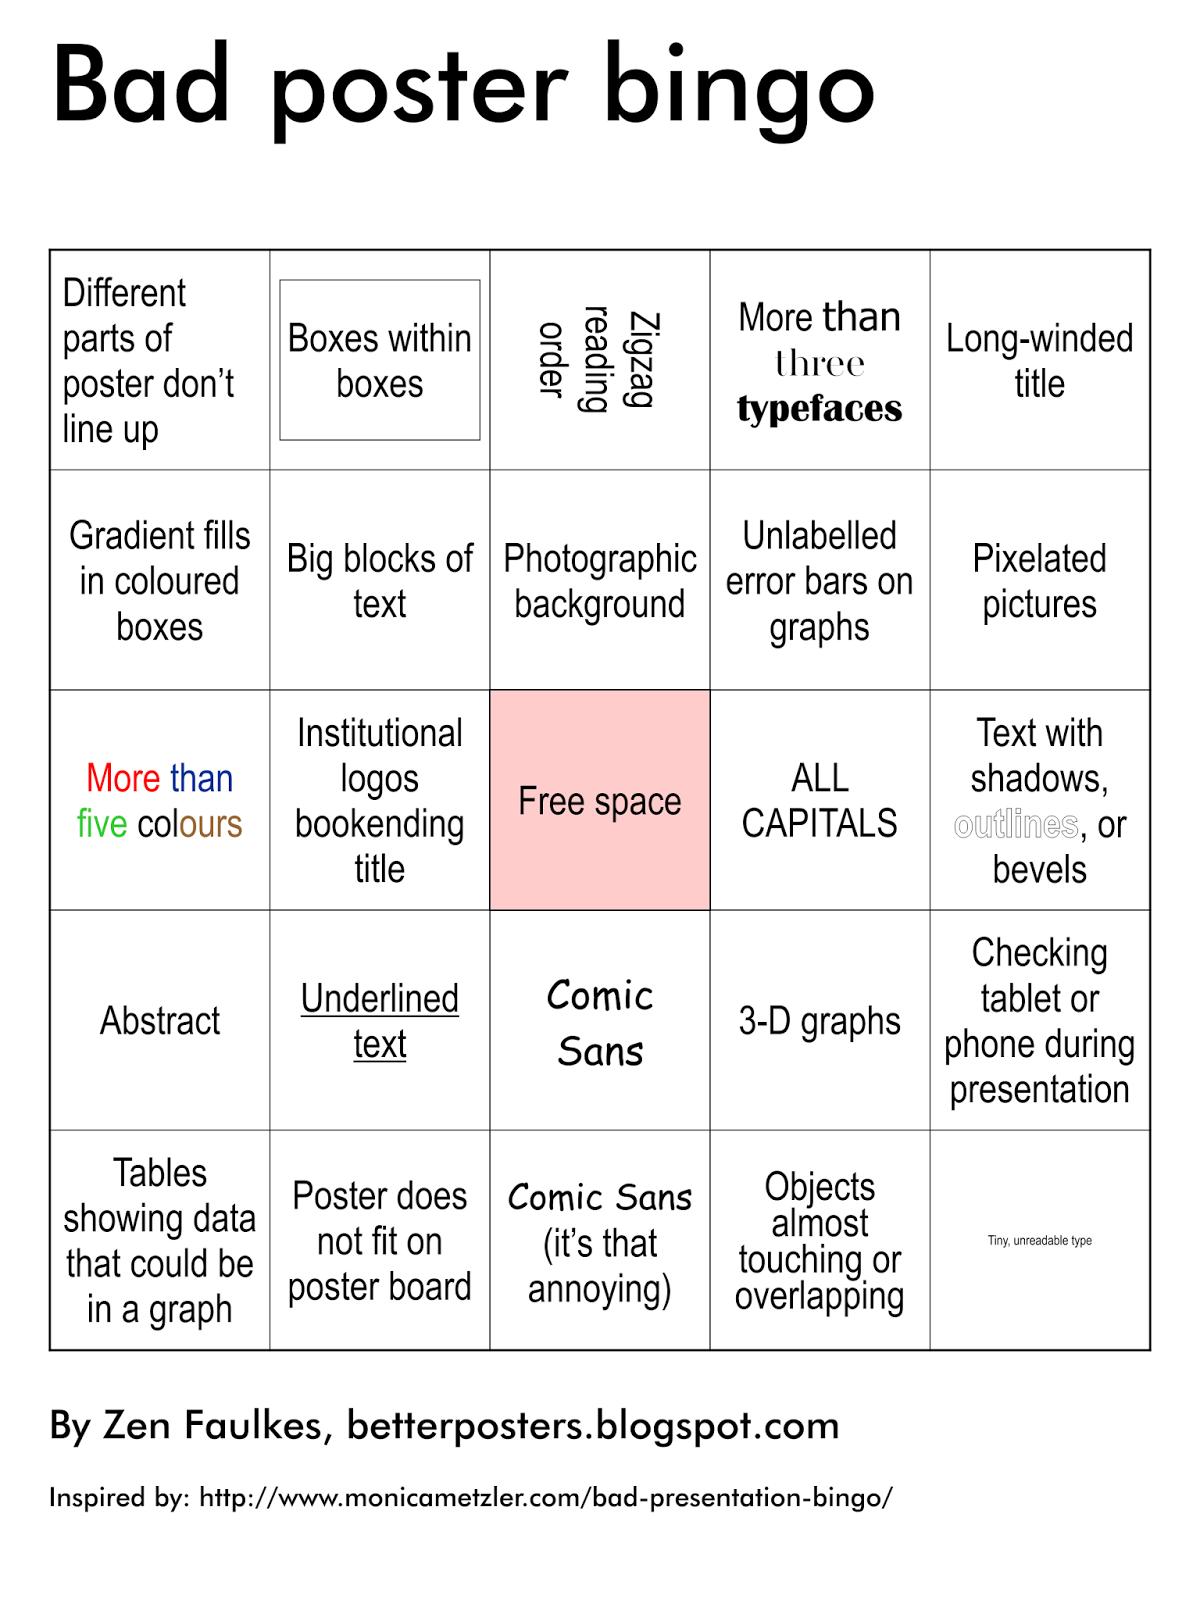 scientific bad poster bingo  u2013   home  koolinus